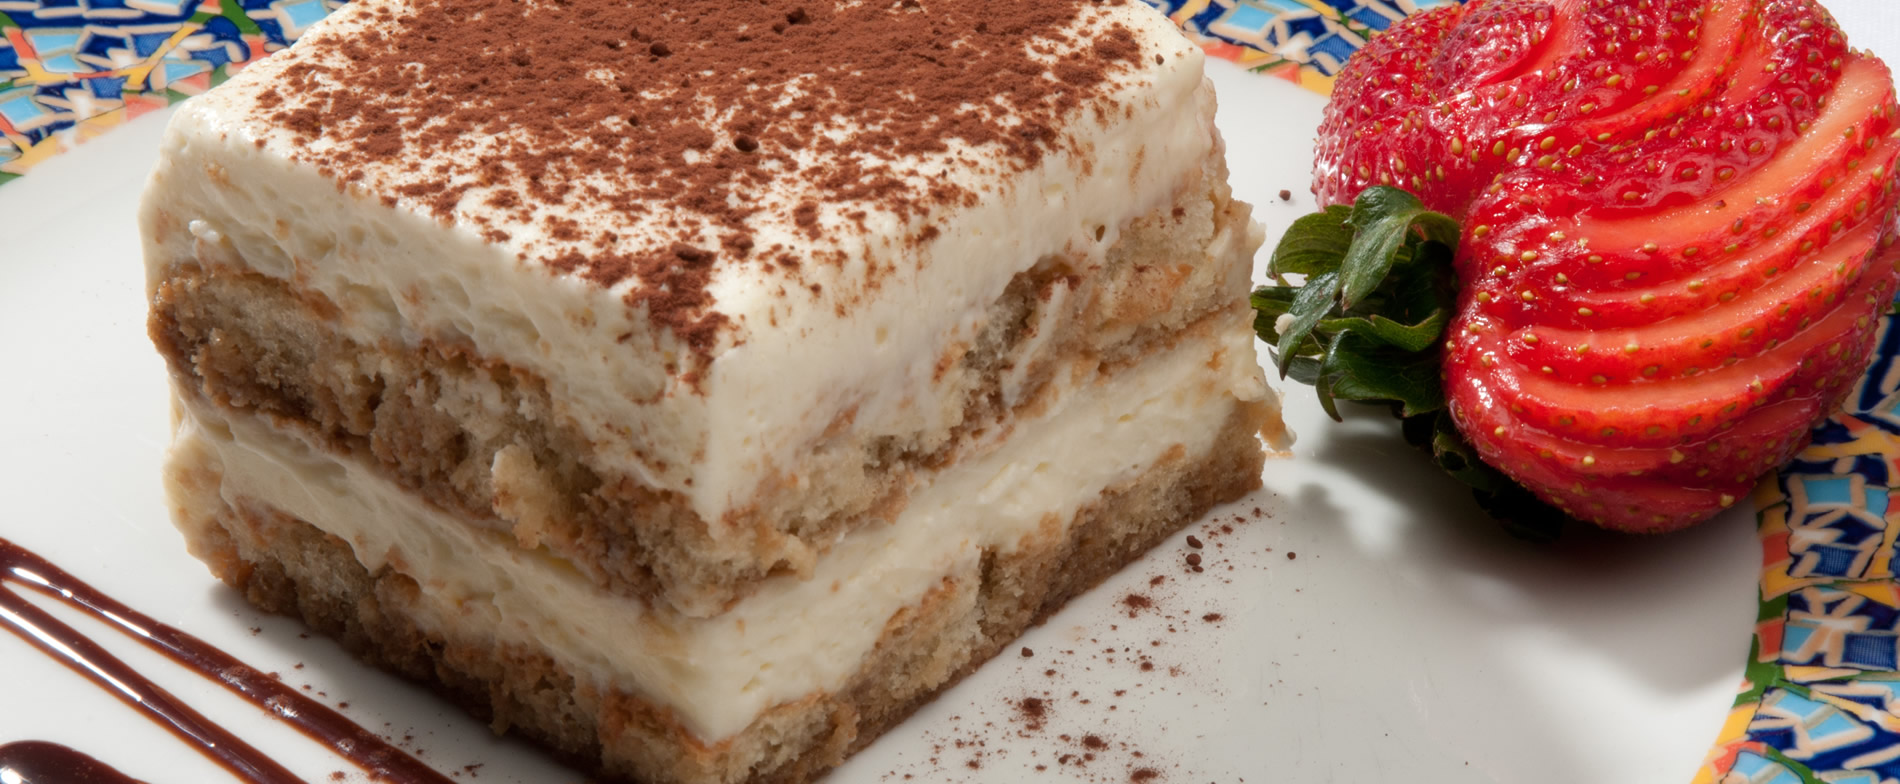 Desserts and Coffee Menu